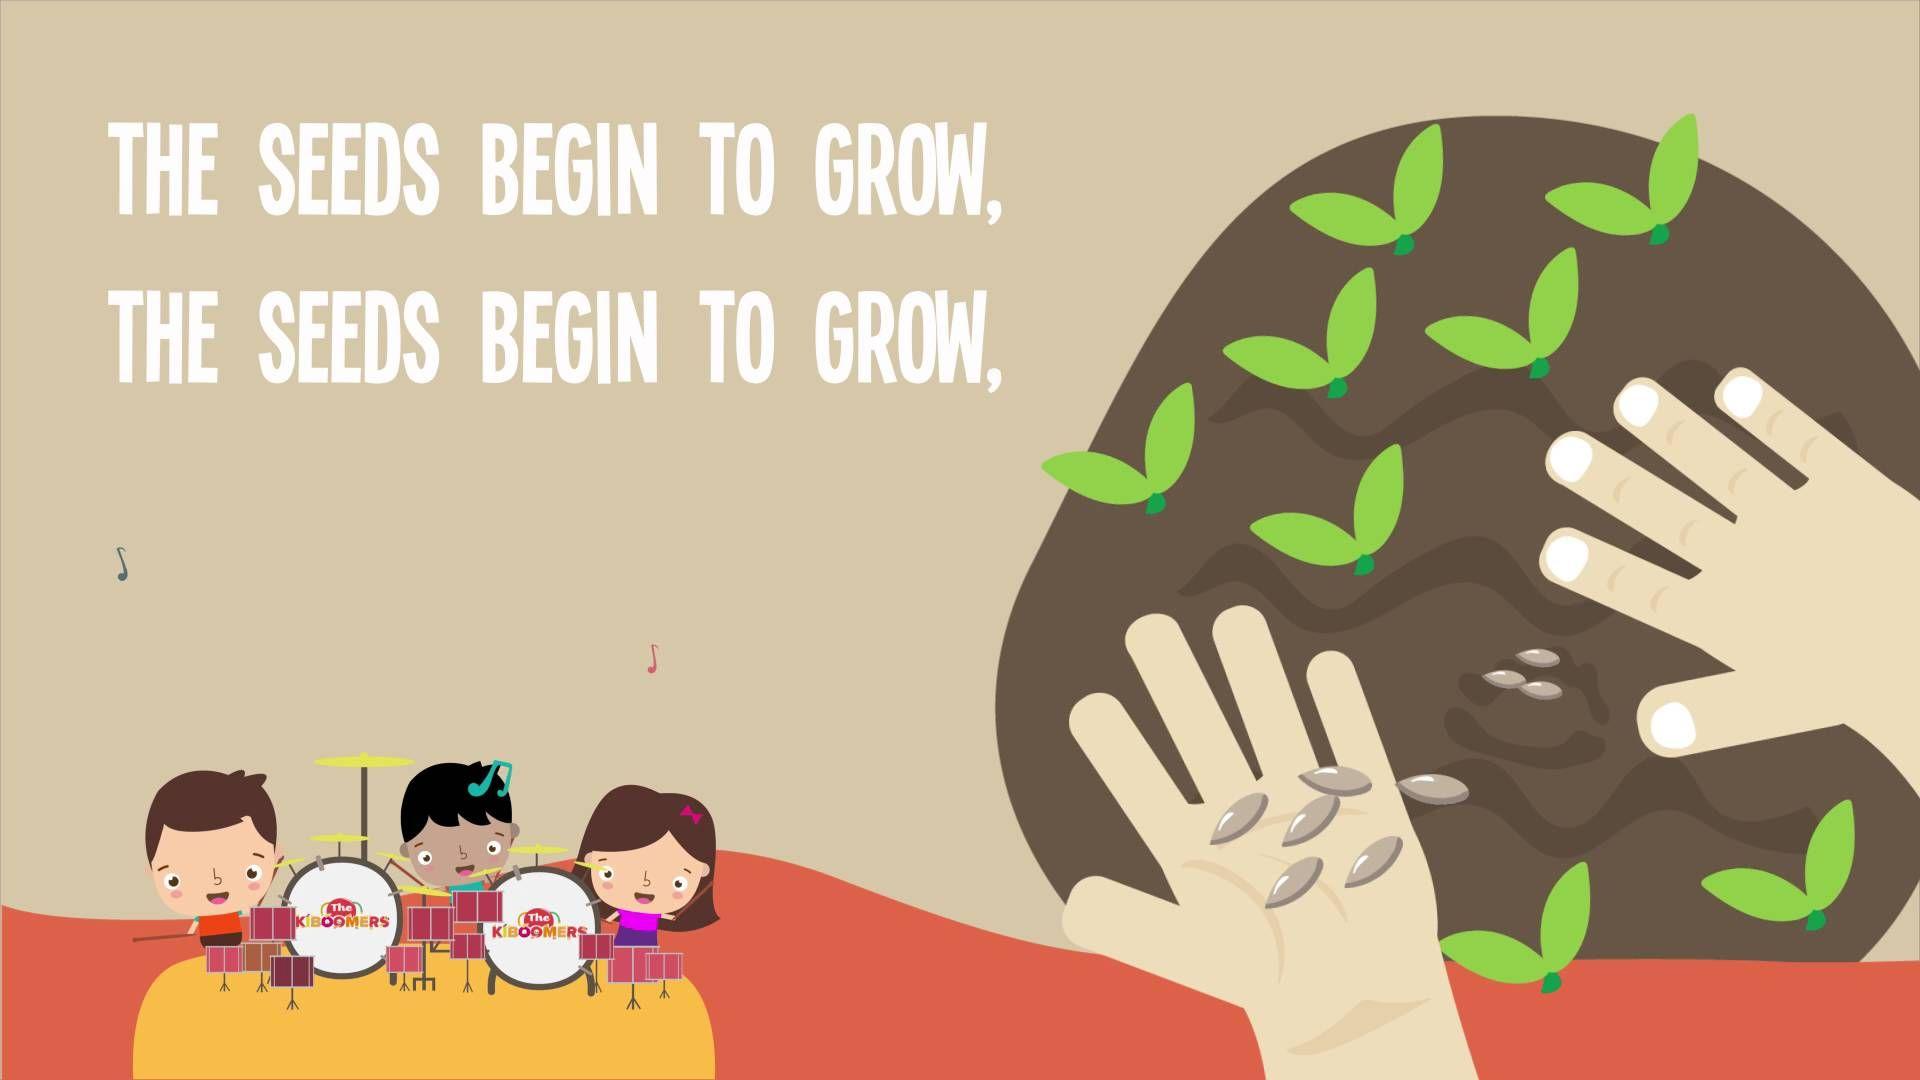 The Farmer Plants The Seeds Song Lyrics For Kids